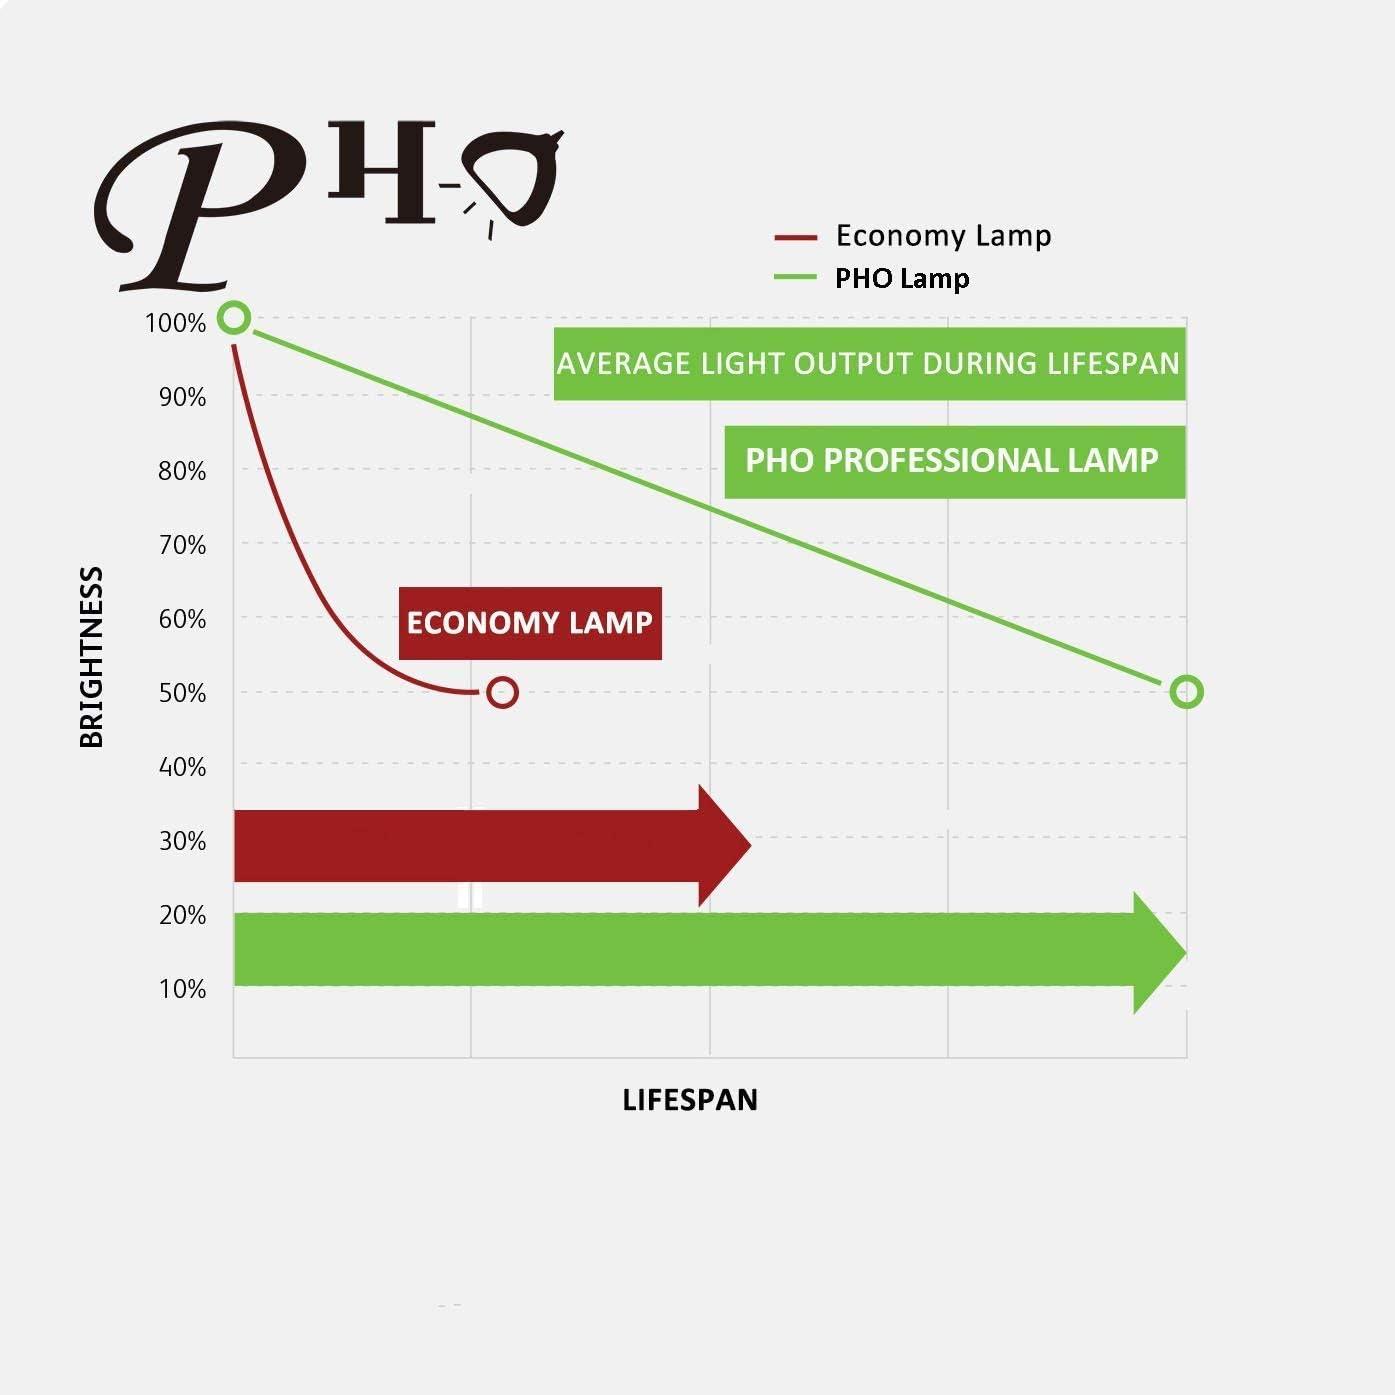 PHO ET-LAE900 Genuine Original Replacement Bulb / Lamp with Housing for Panasonic PT-AE900 PT-AE900E PT-AE900U Projector (OEM Bulb Inside)